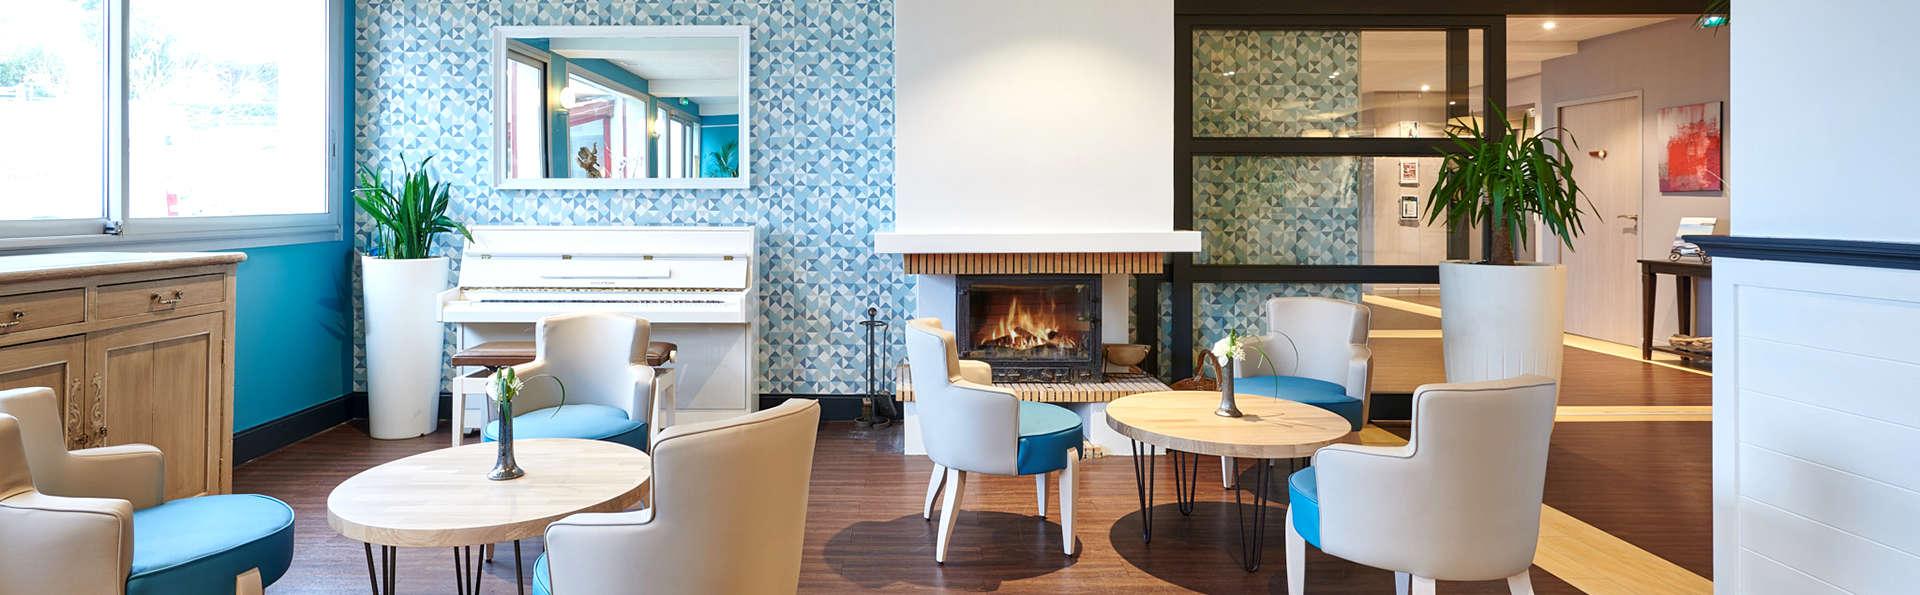 Hôtel Le Biarritz - EDIT_NEW_LOBBY.jpg